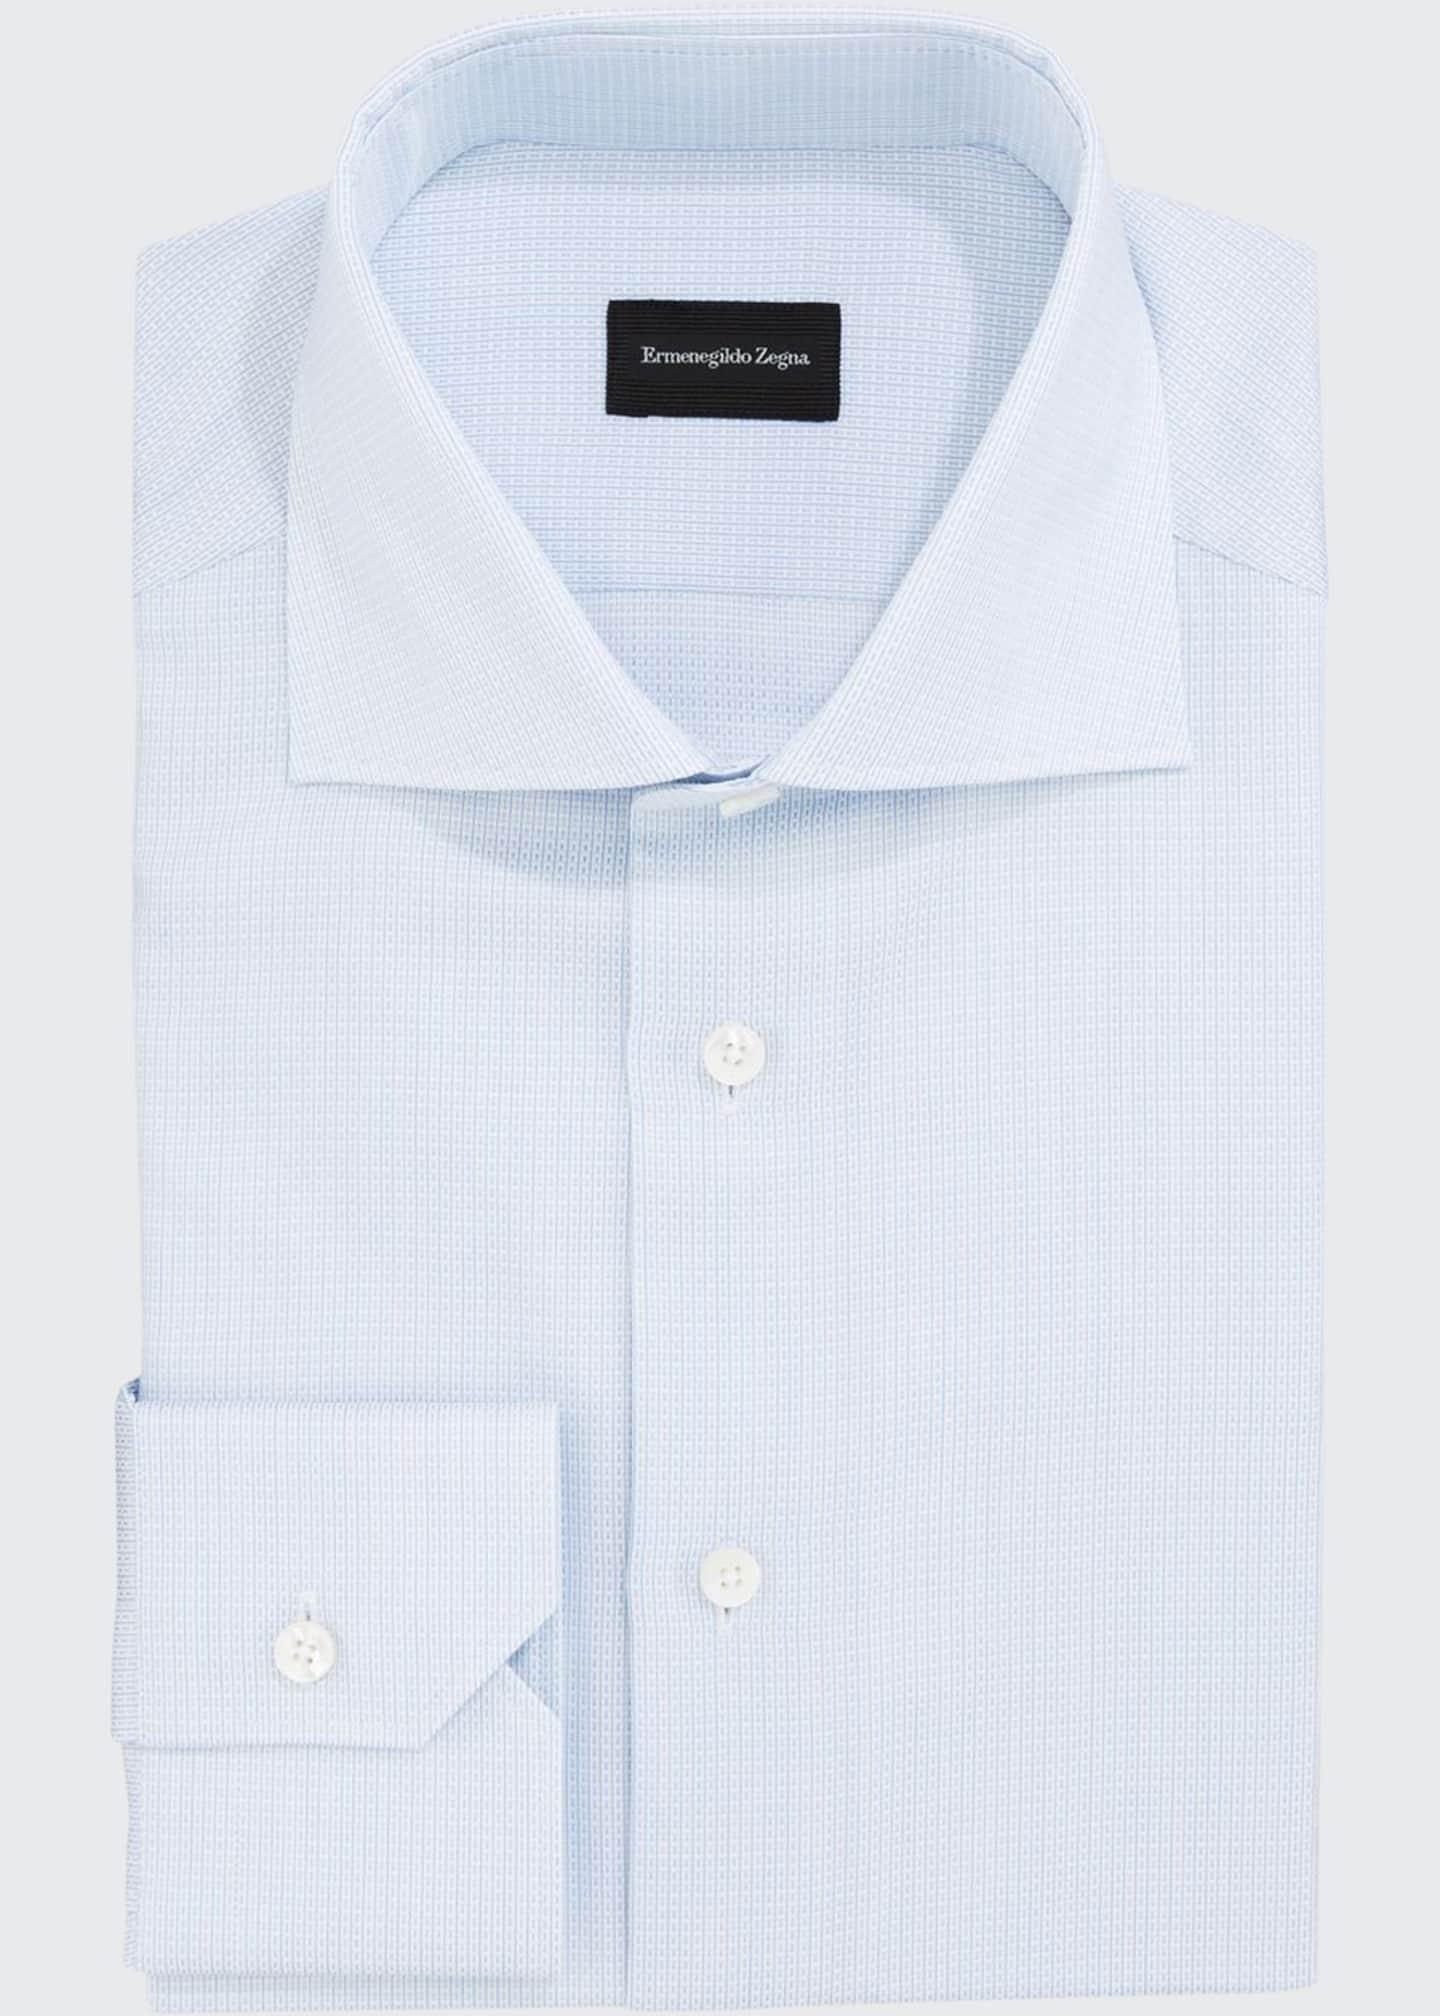 Ermenegildo Zegna Men's Structured Tic Dress Shirt